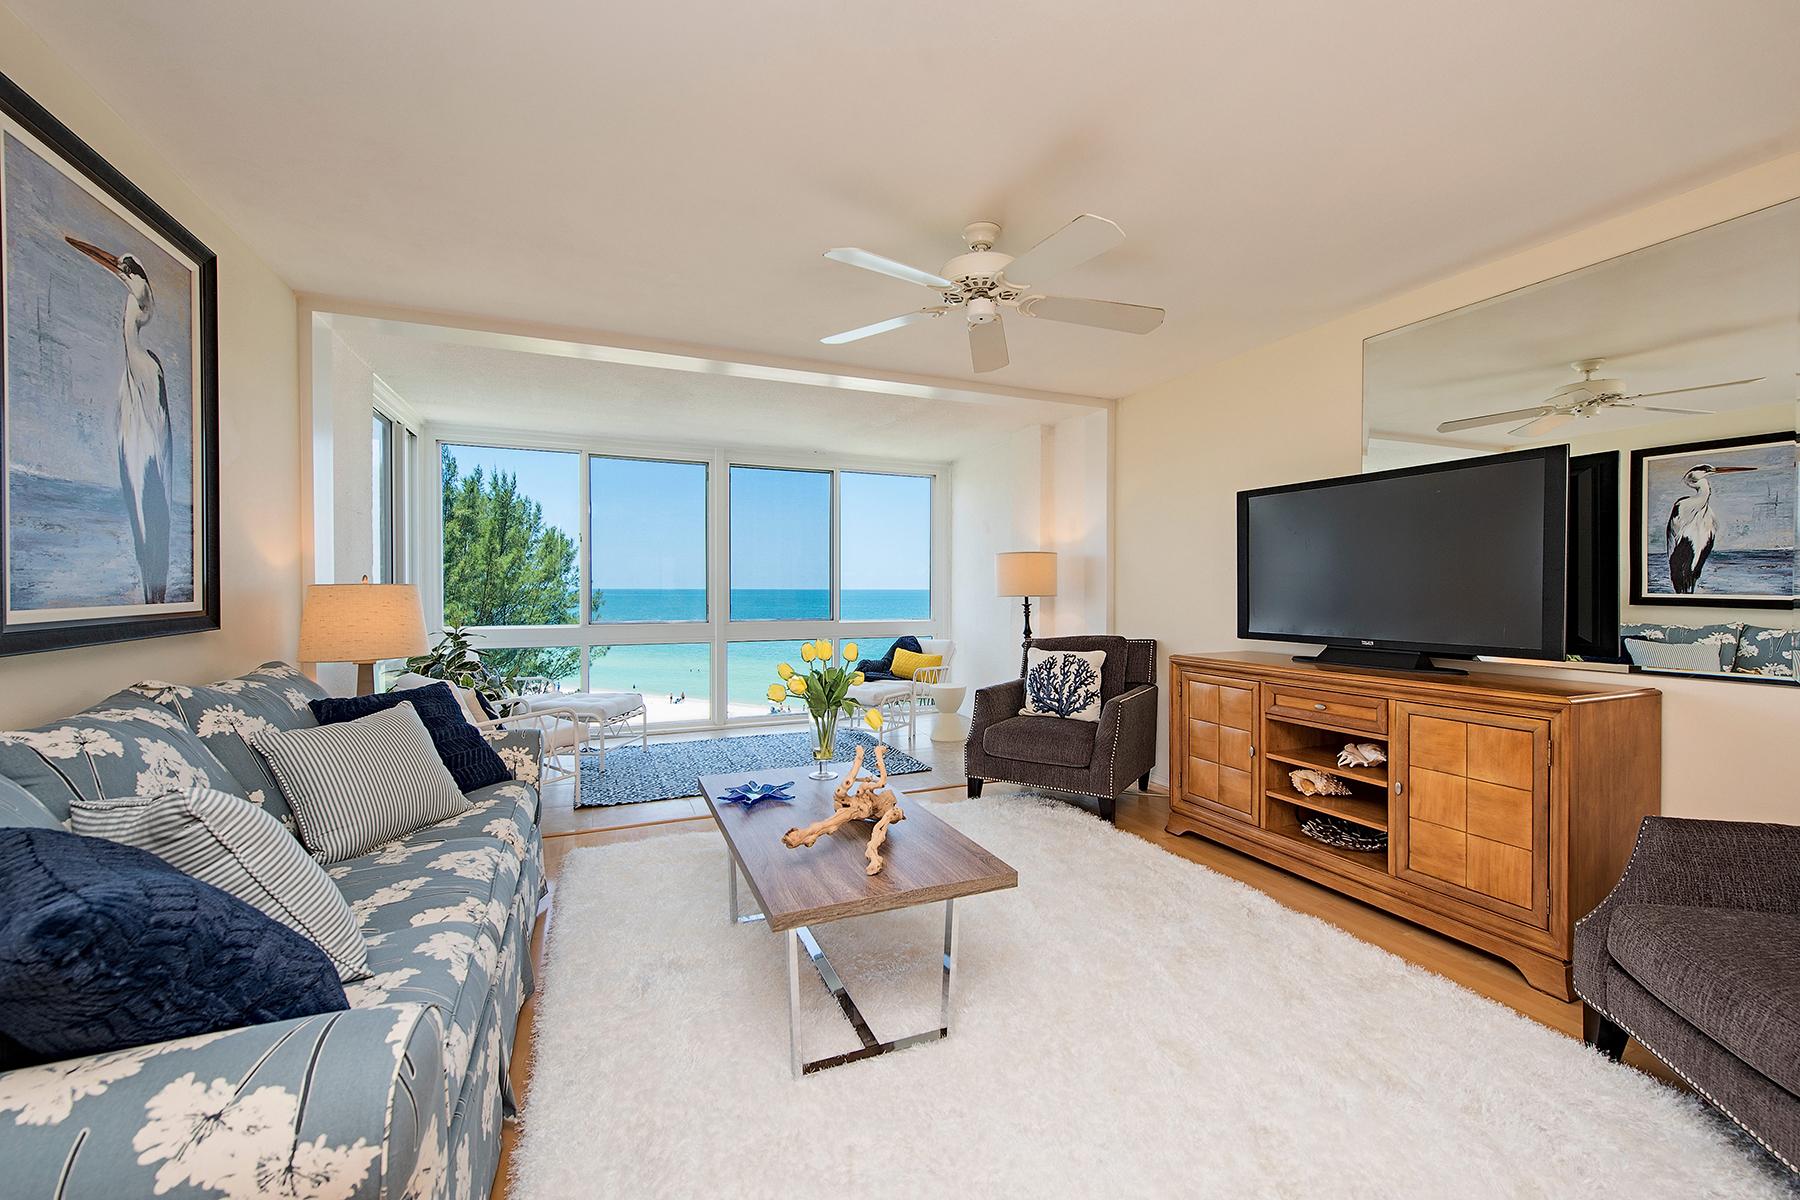 Condominio por un Venta en MOORINGS - ROYAL PALM CLUB 2121 Gulf Shore Blvd N 507 Naples, Florida, 34102 Estados Unidos